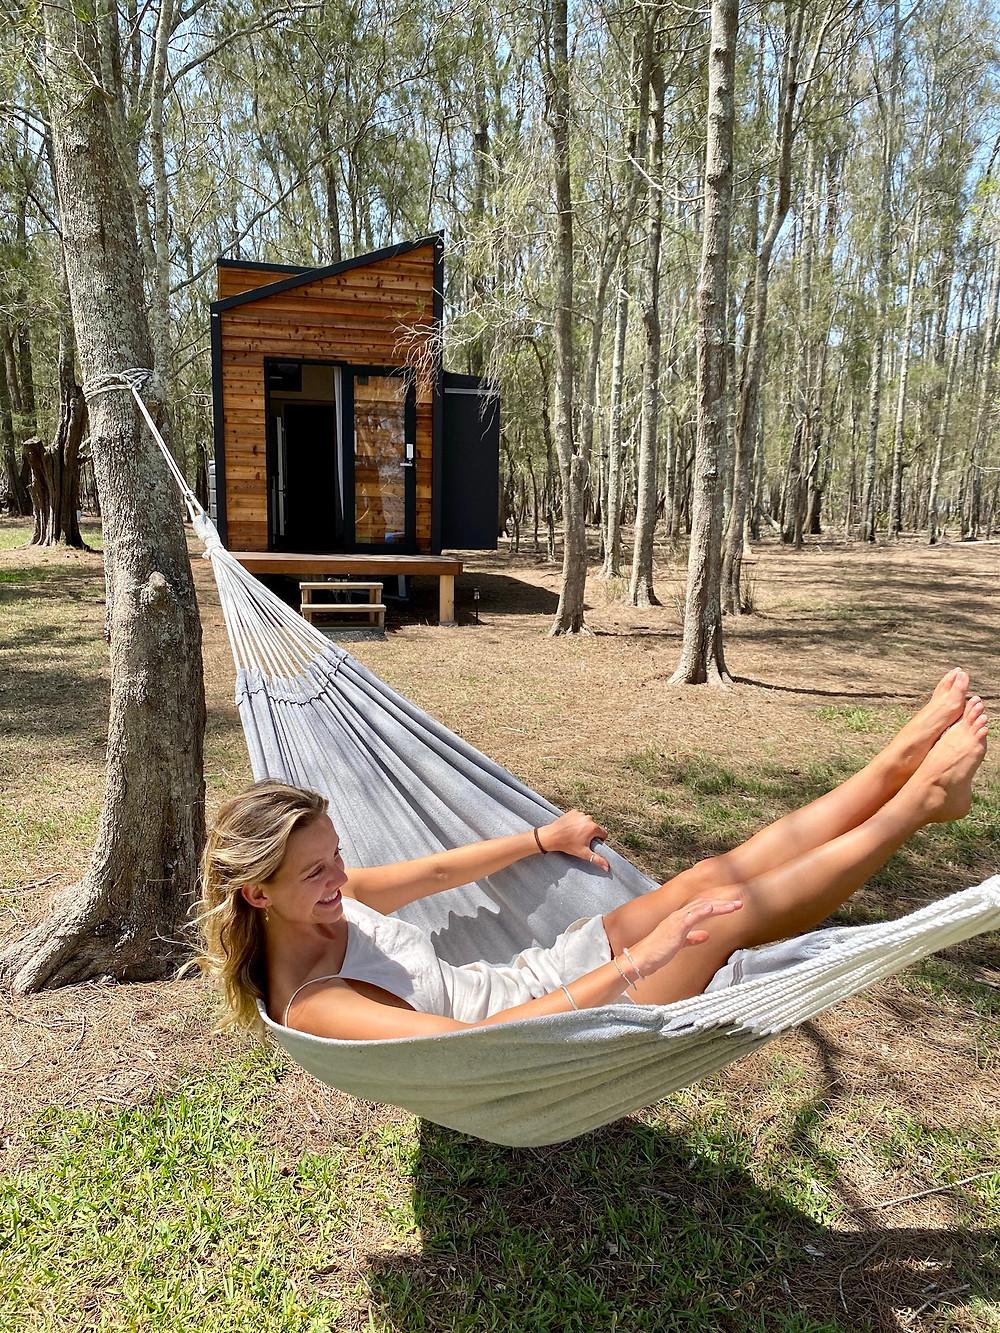 Hauslein Tiny House Co. girl on a hammock simplifying life living in a tiny house, tiny house featured on Brilliant-Online magazine